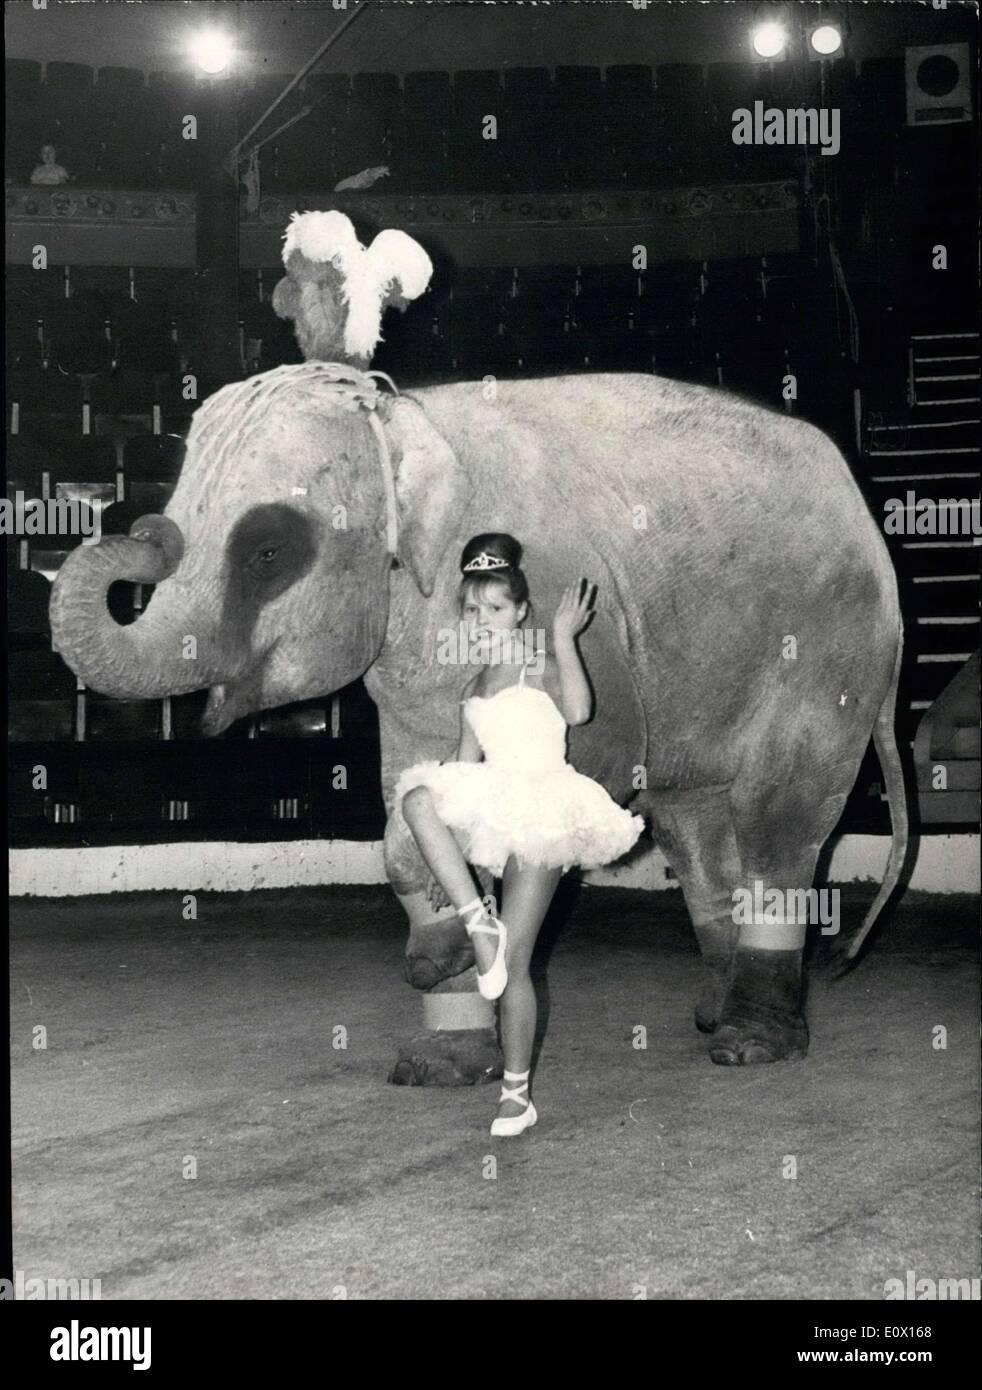 Dec. 01, 1964 - Angelica Buckler with Jumbo the Elephant Stock Photo